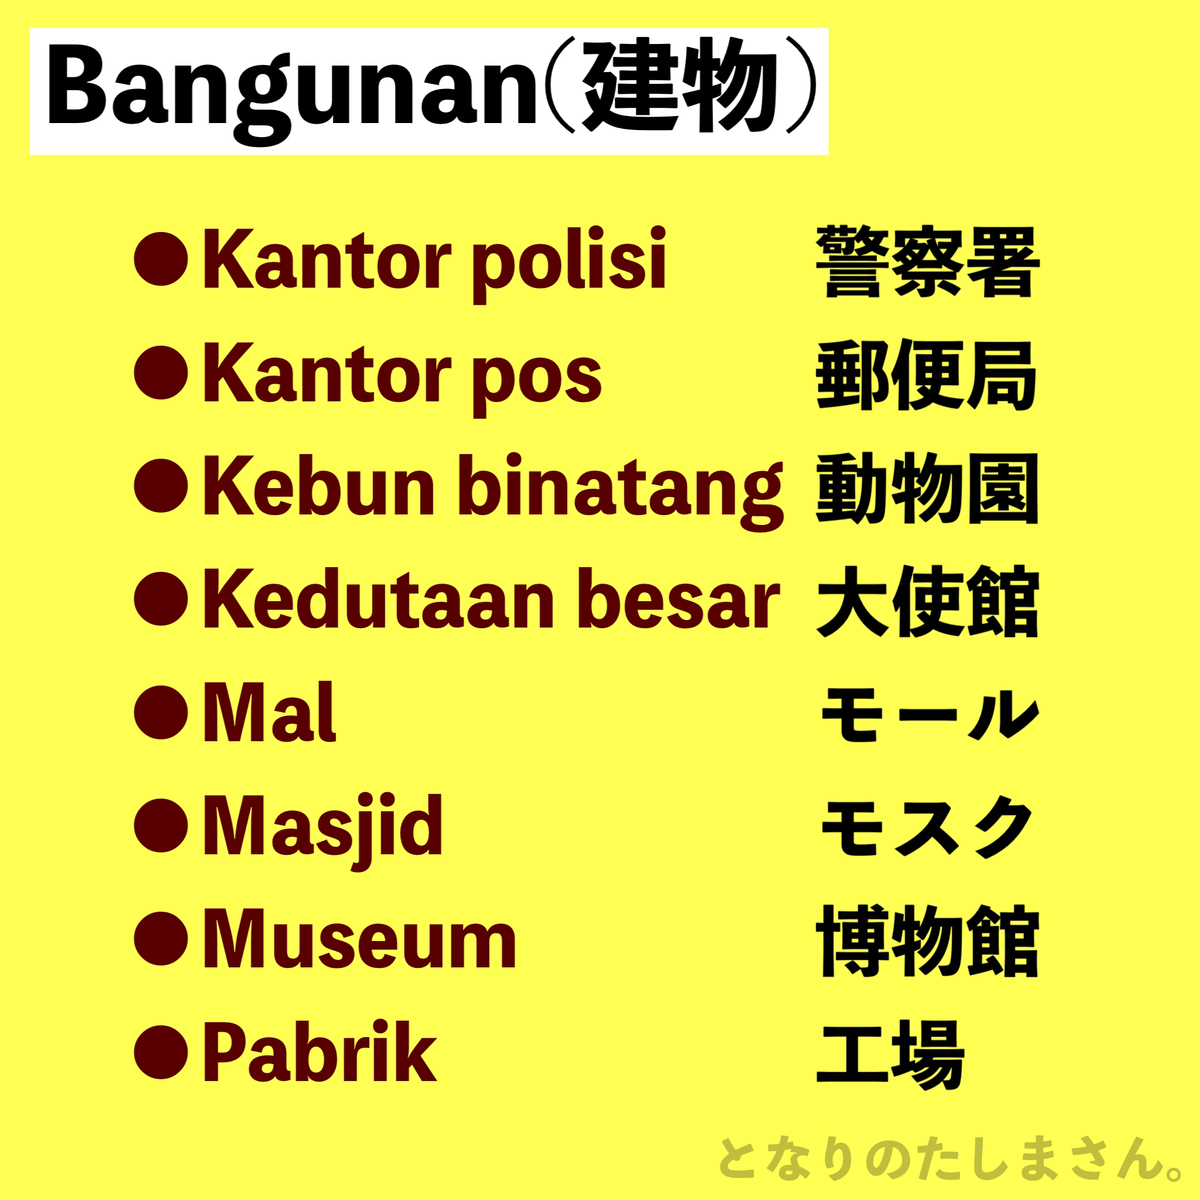 f:id:yutonsmaile:20210928153810j:plain